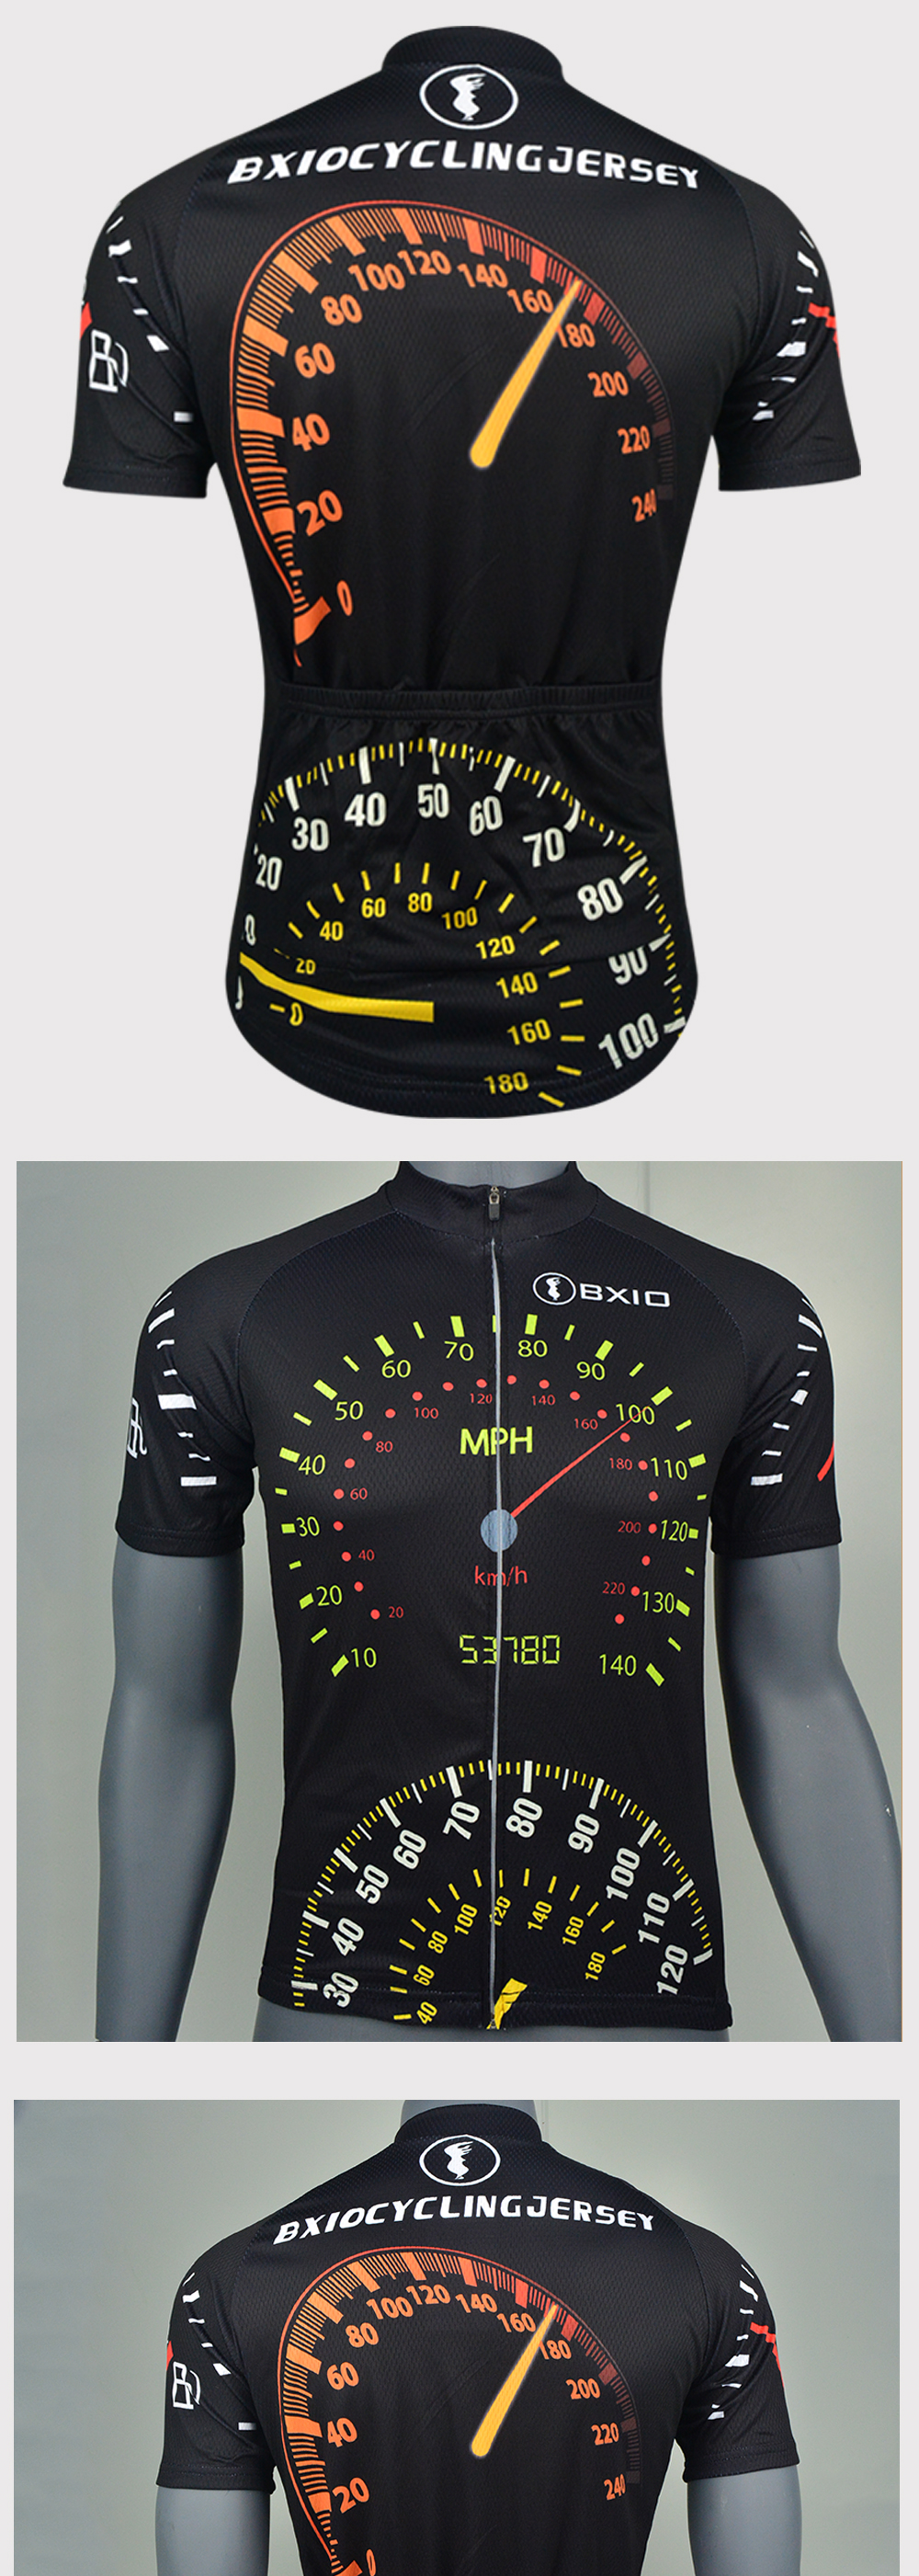 ⑥Hot Bxio Brand Cycling Jersey 2018 Sport Bike Jerseys Short Sleeve ... 19b4ce587